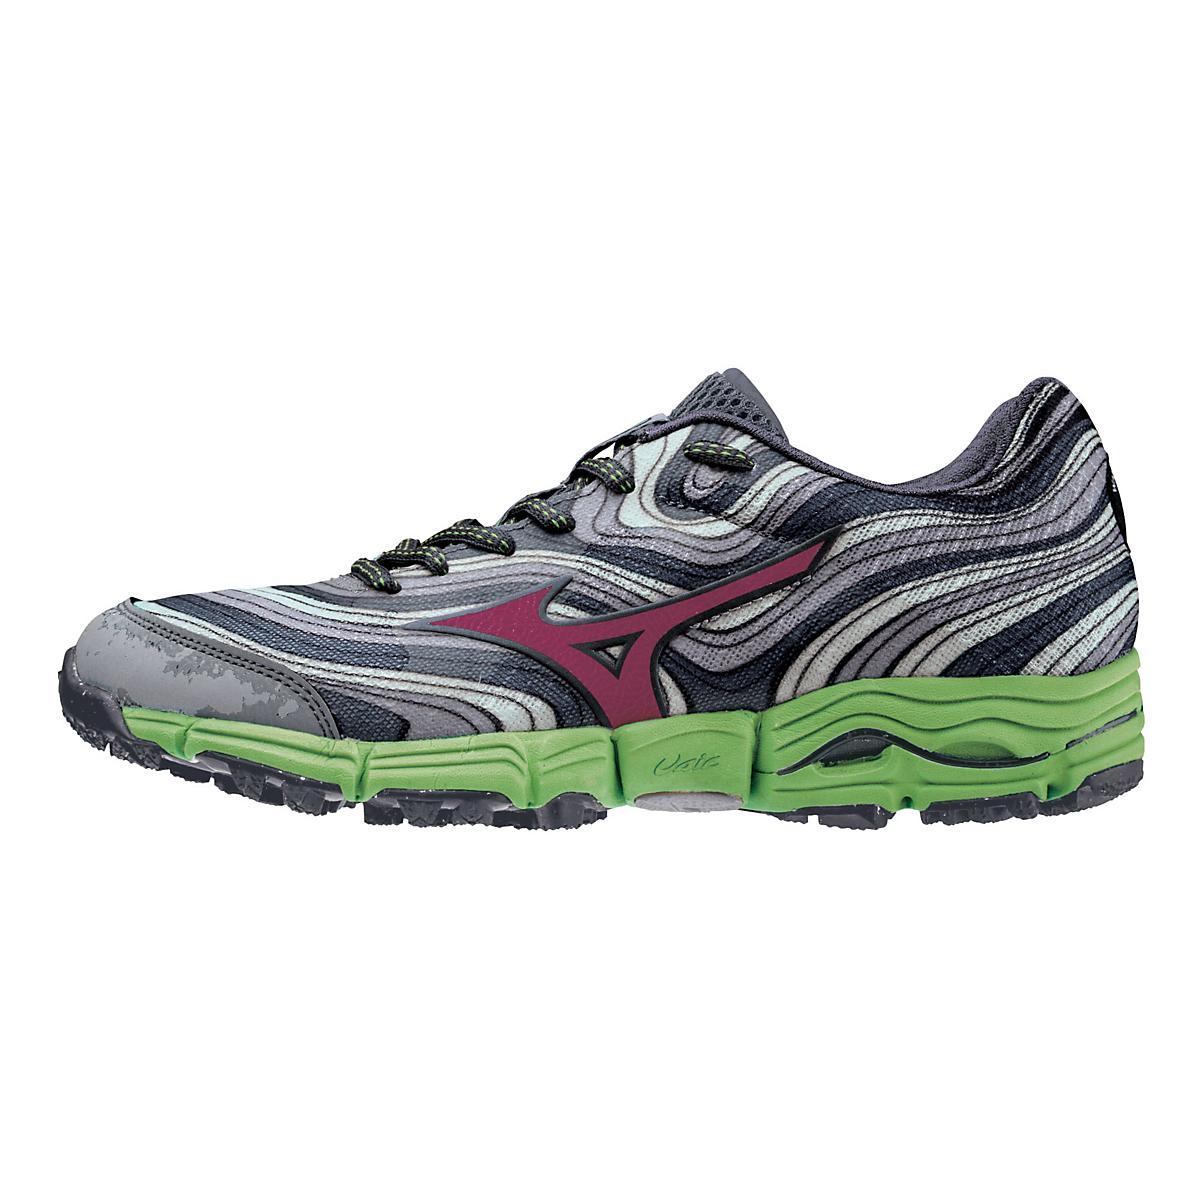 e881fbac7b37 Womens Mizuno Wave Kazan Trail Running Shoe at Road Runner Sports